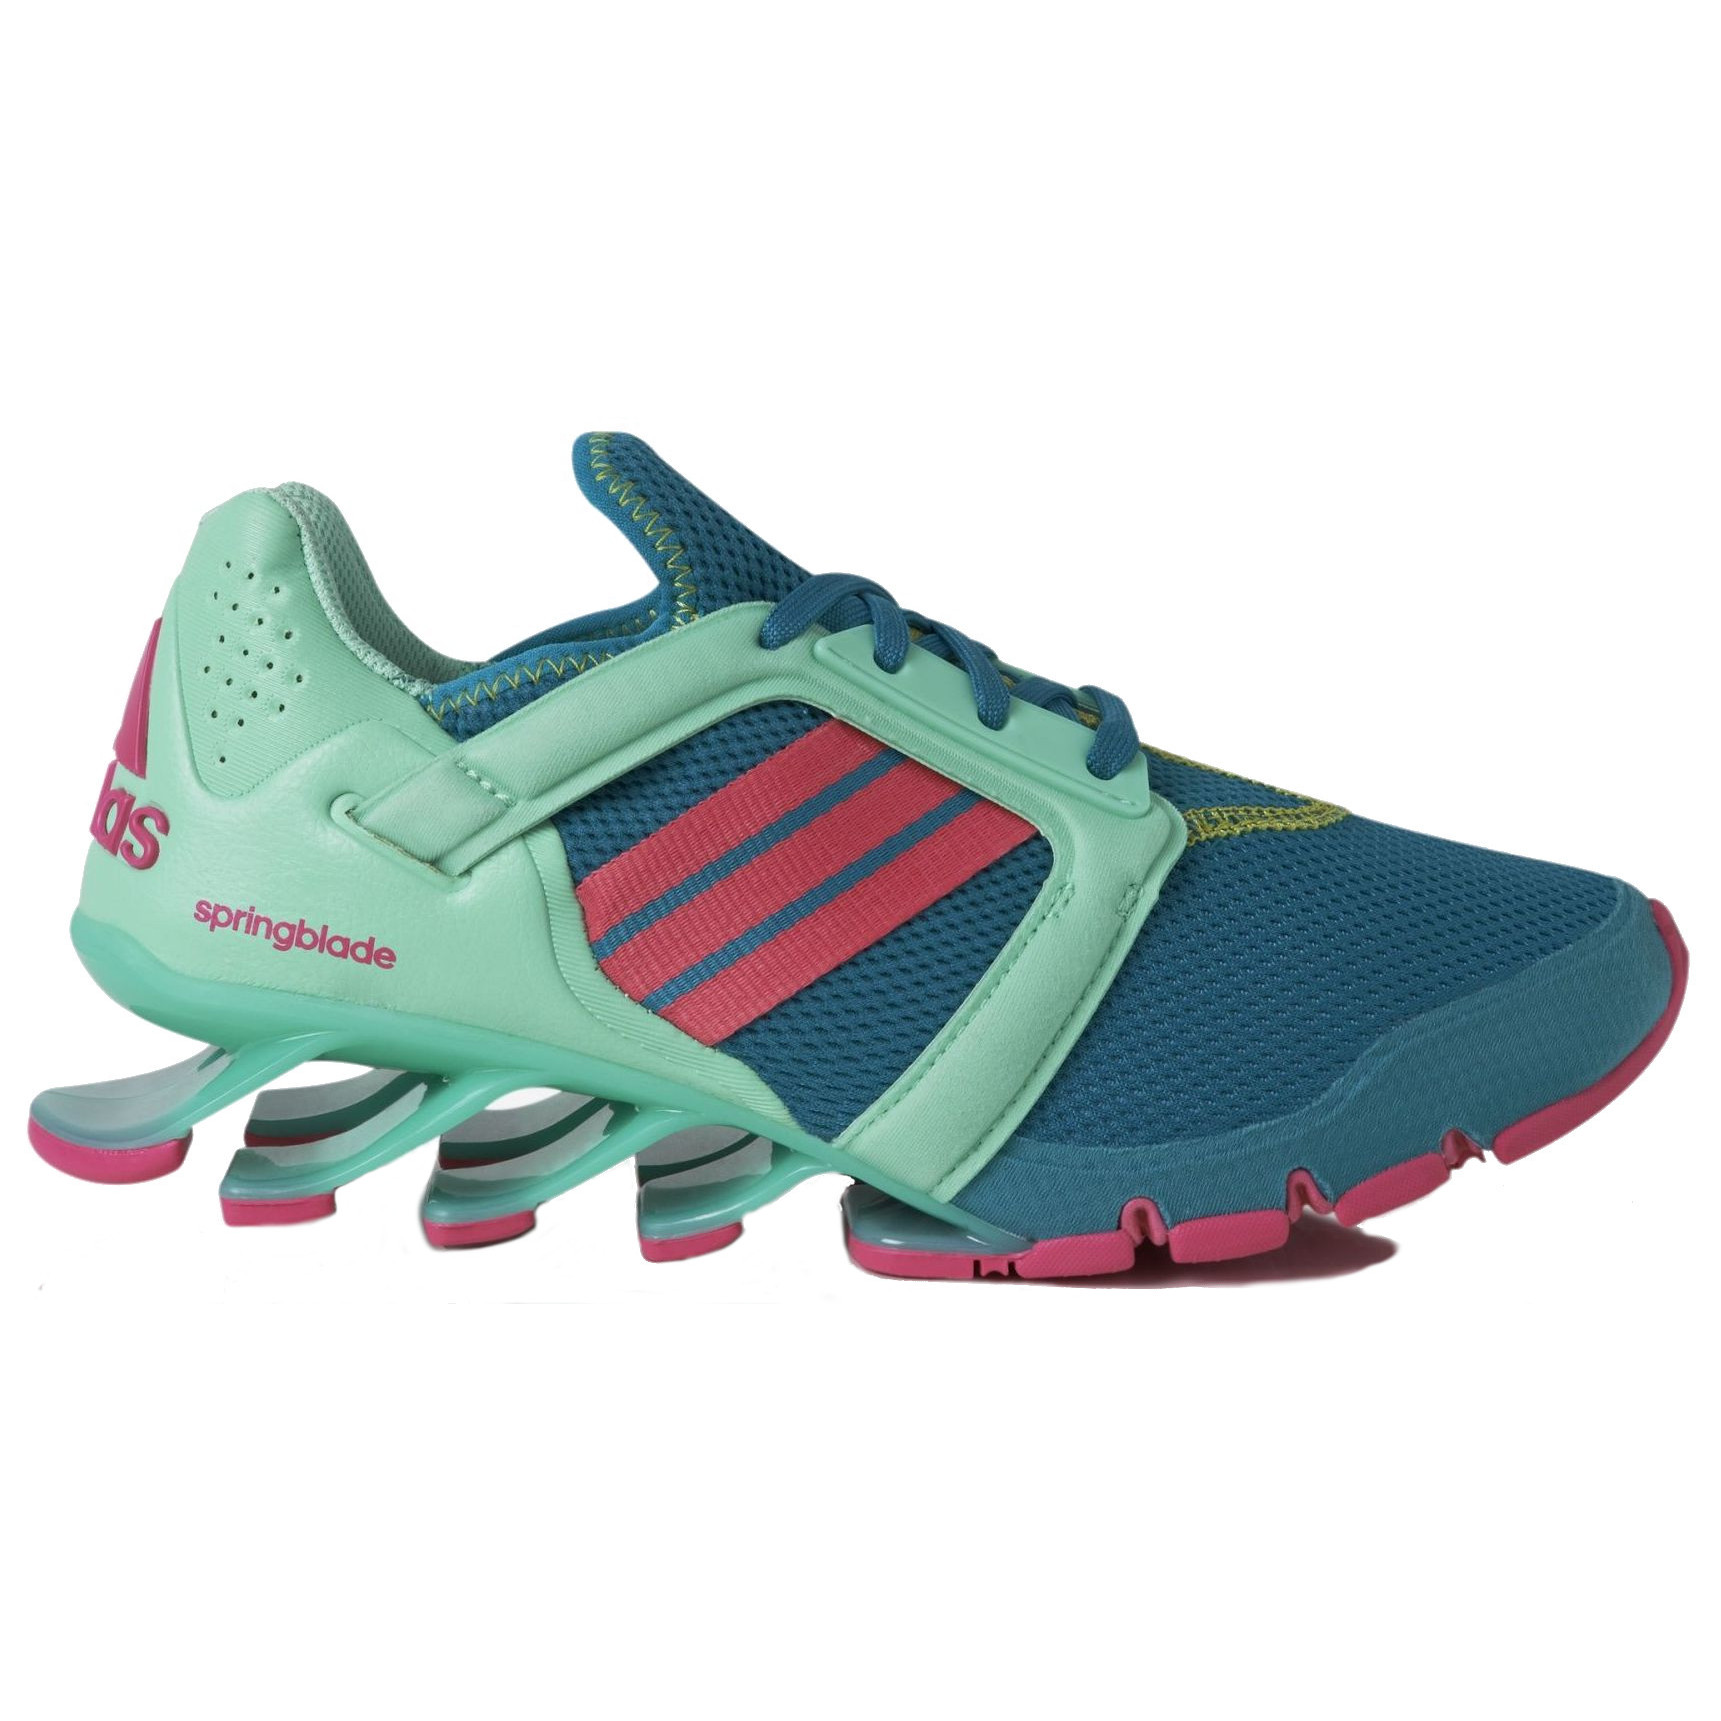 Buty Damskie Adidas Do Biegania Aq5255 37 1 3 7325850217 Allegro Pl